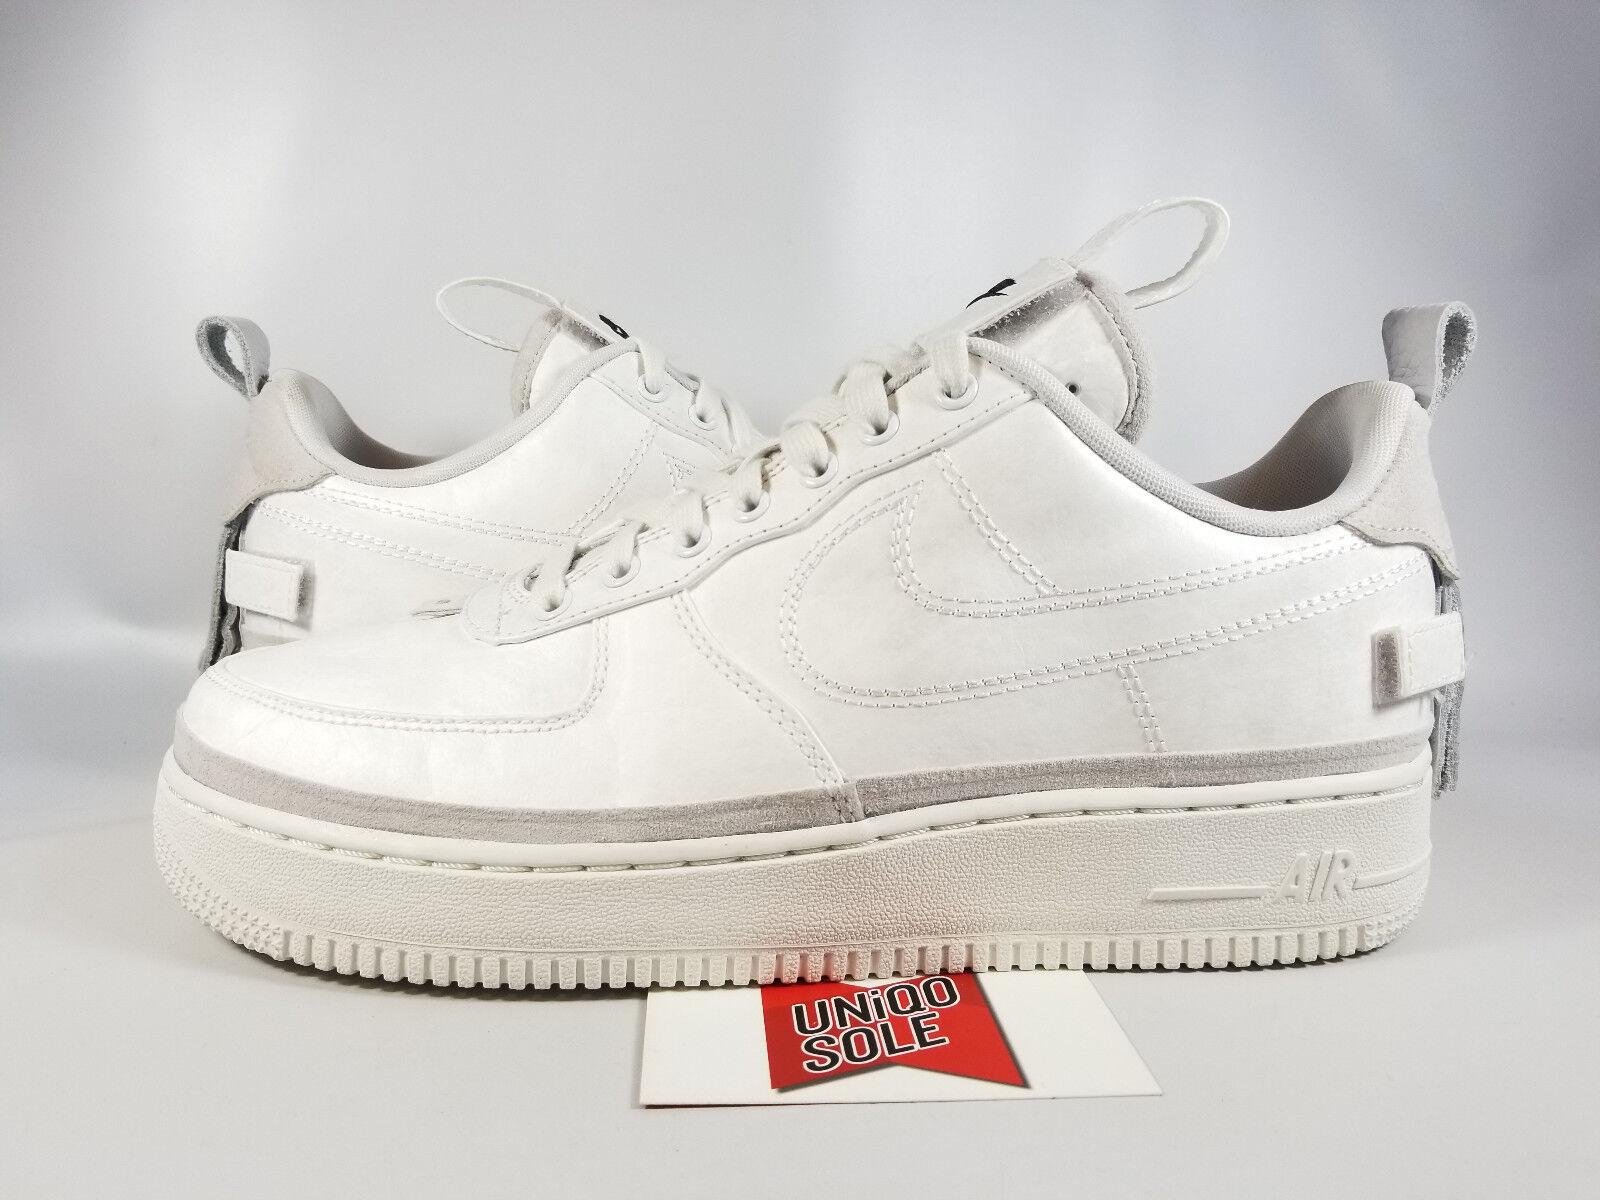 Nike Air Force 1 AF1 Low ALL STAR 90 10 OFF WHITE VAST GREY AH6767-001 sz 14